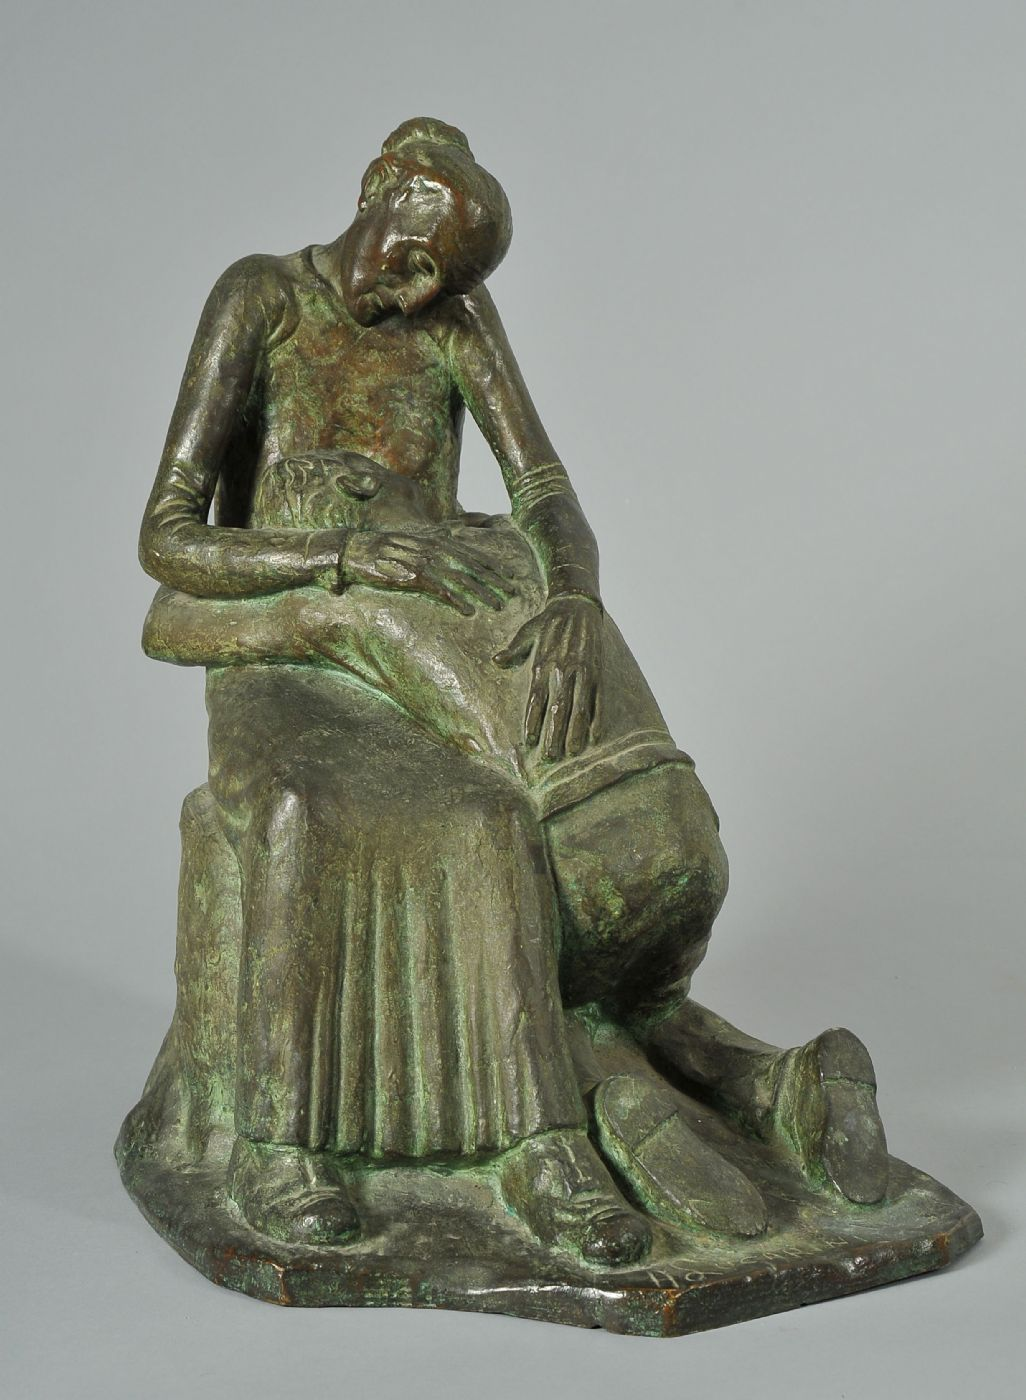 lucarini (Genova 1890 - 1959)